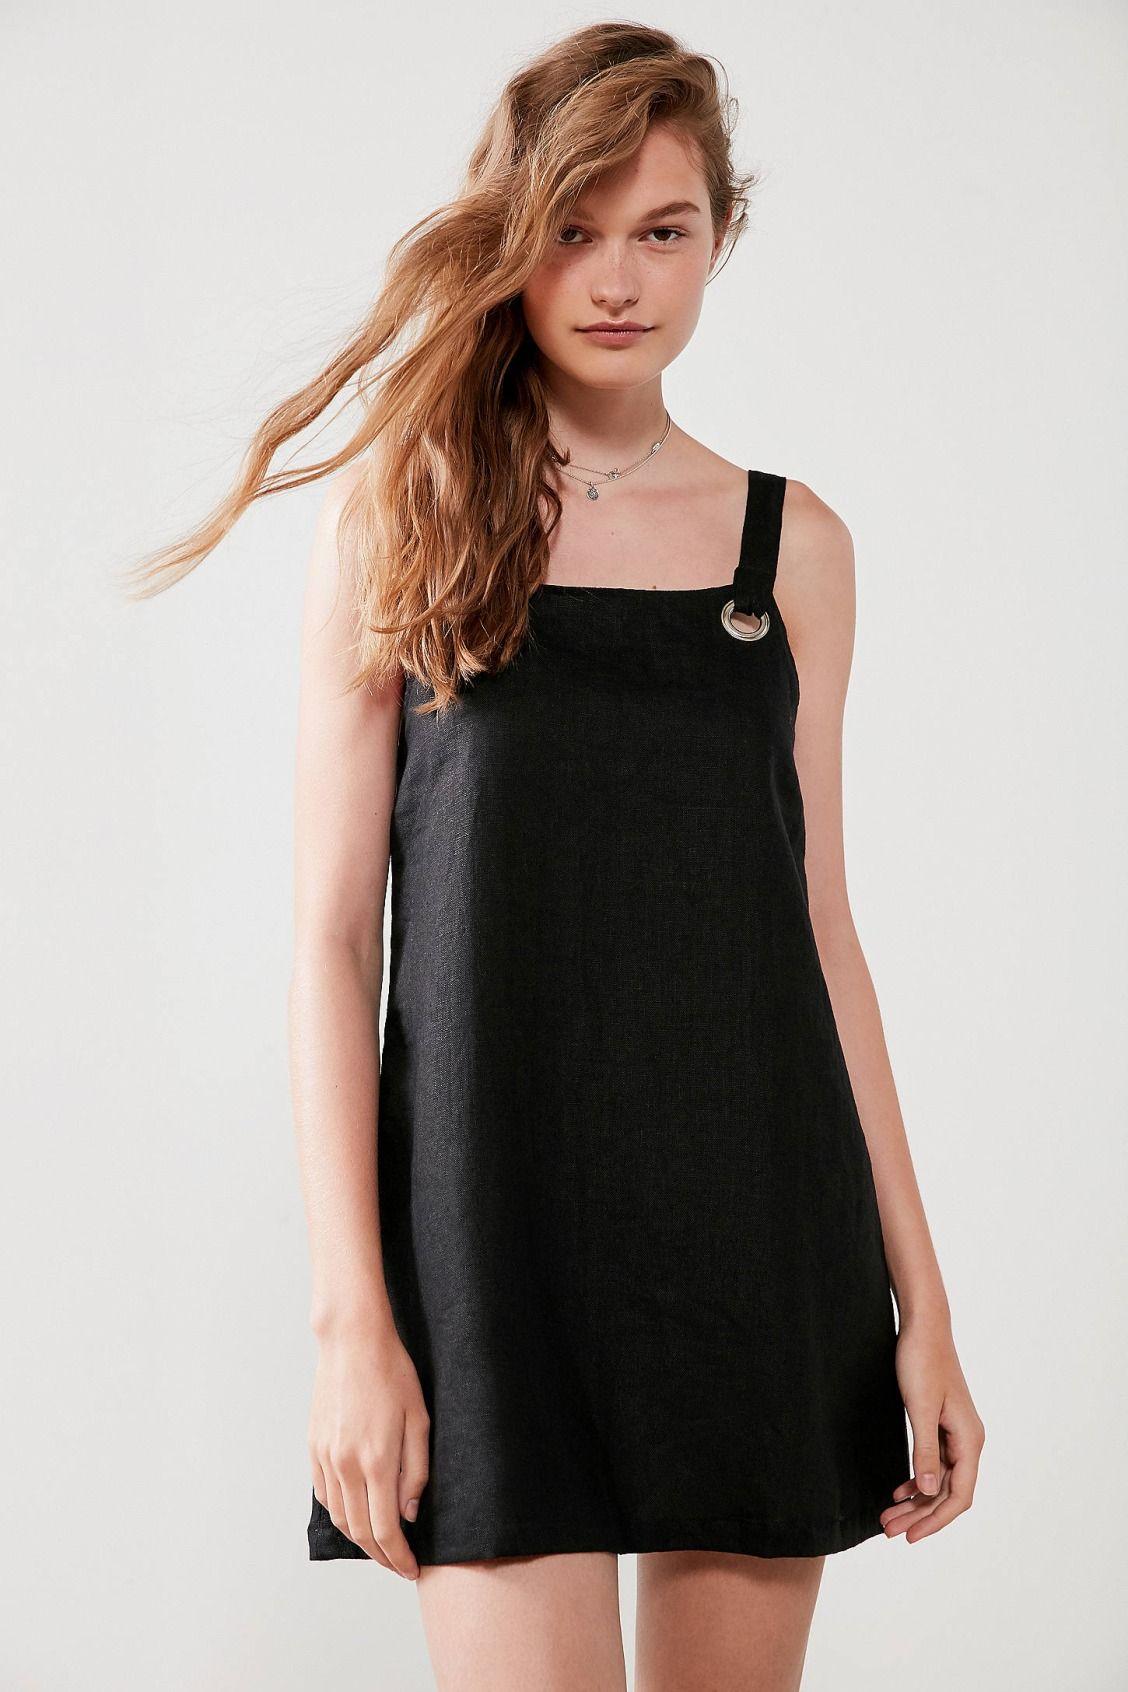 66f70ebe8474c8 Slide View  1  Nice Martin Kendall Grommet Mini Dress